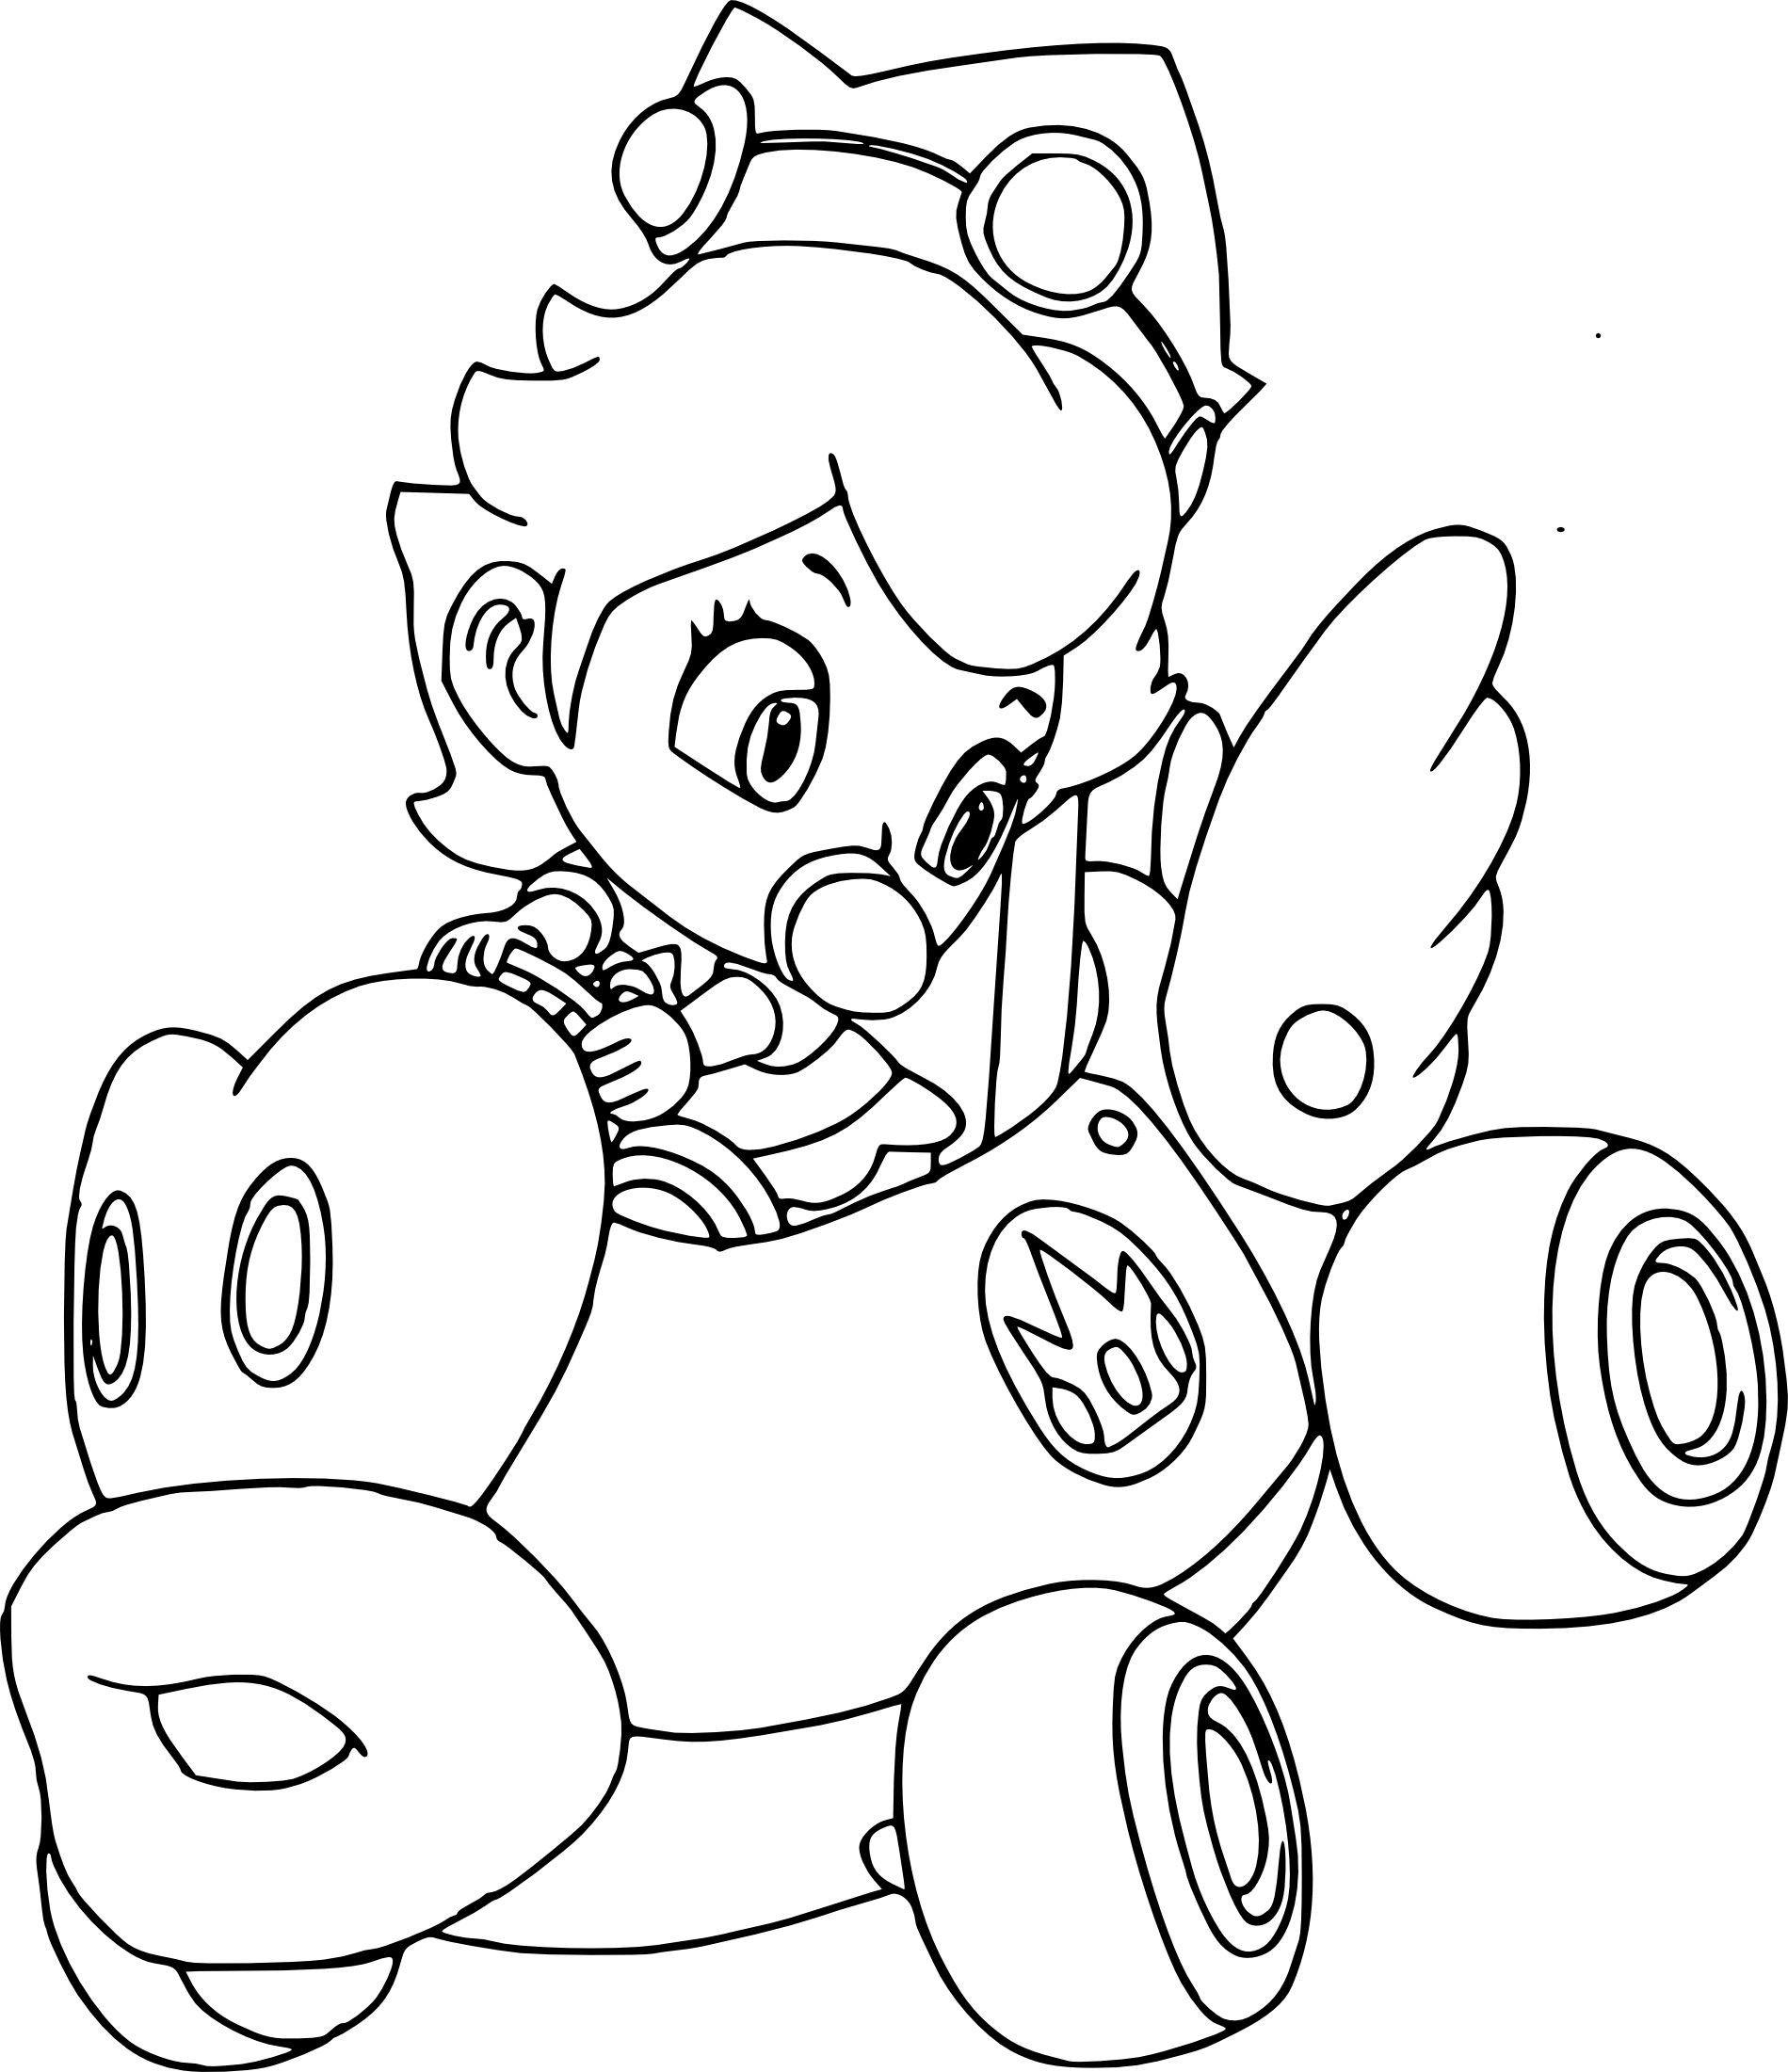 Coloriage Princesse Mario Bros Frais Image R Sultat De Recherche ...